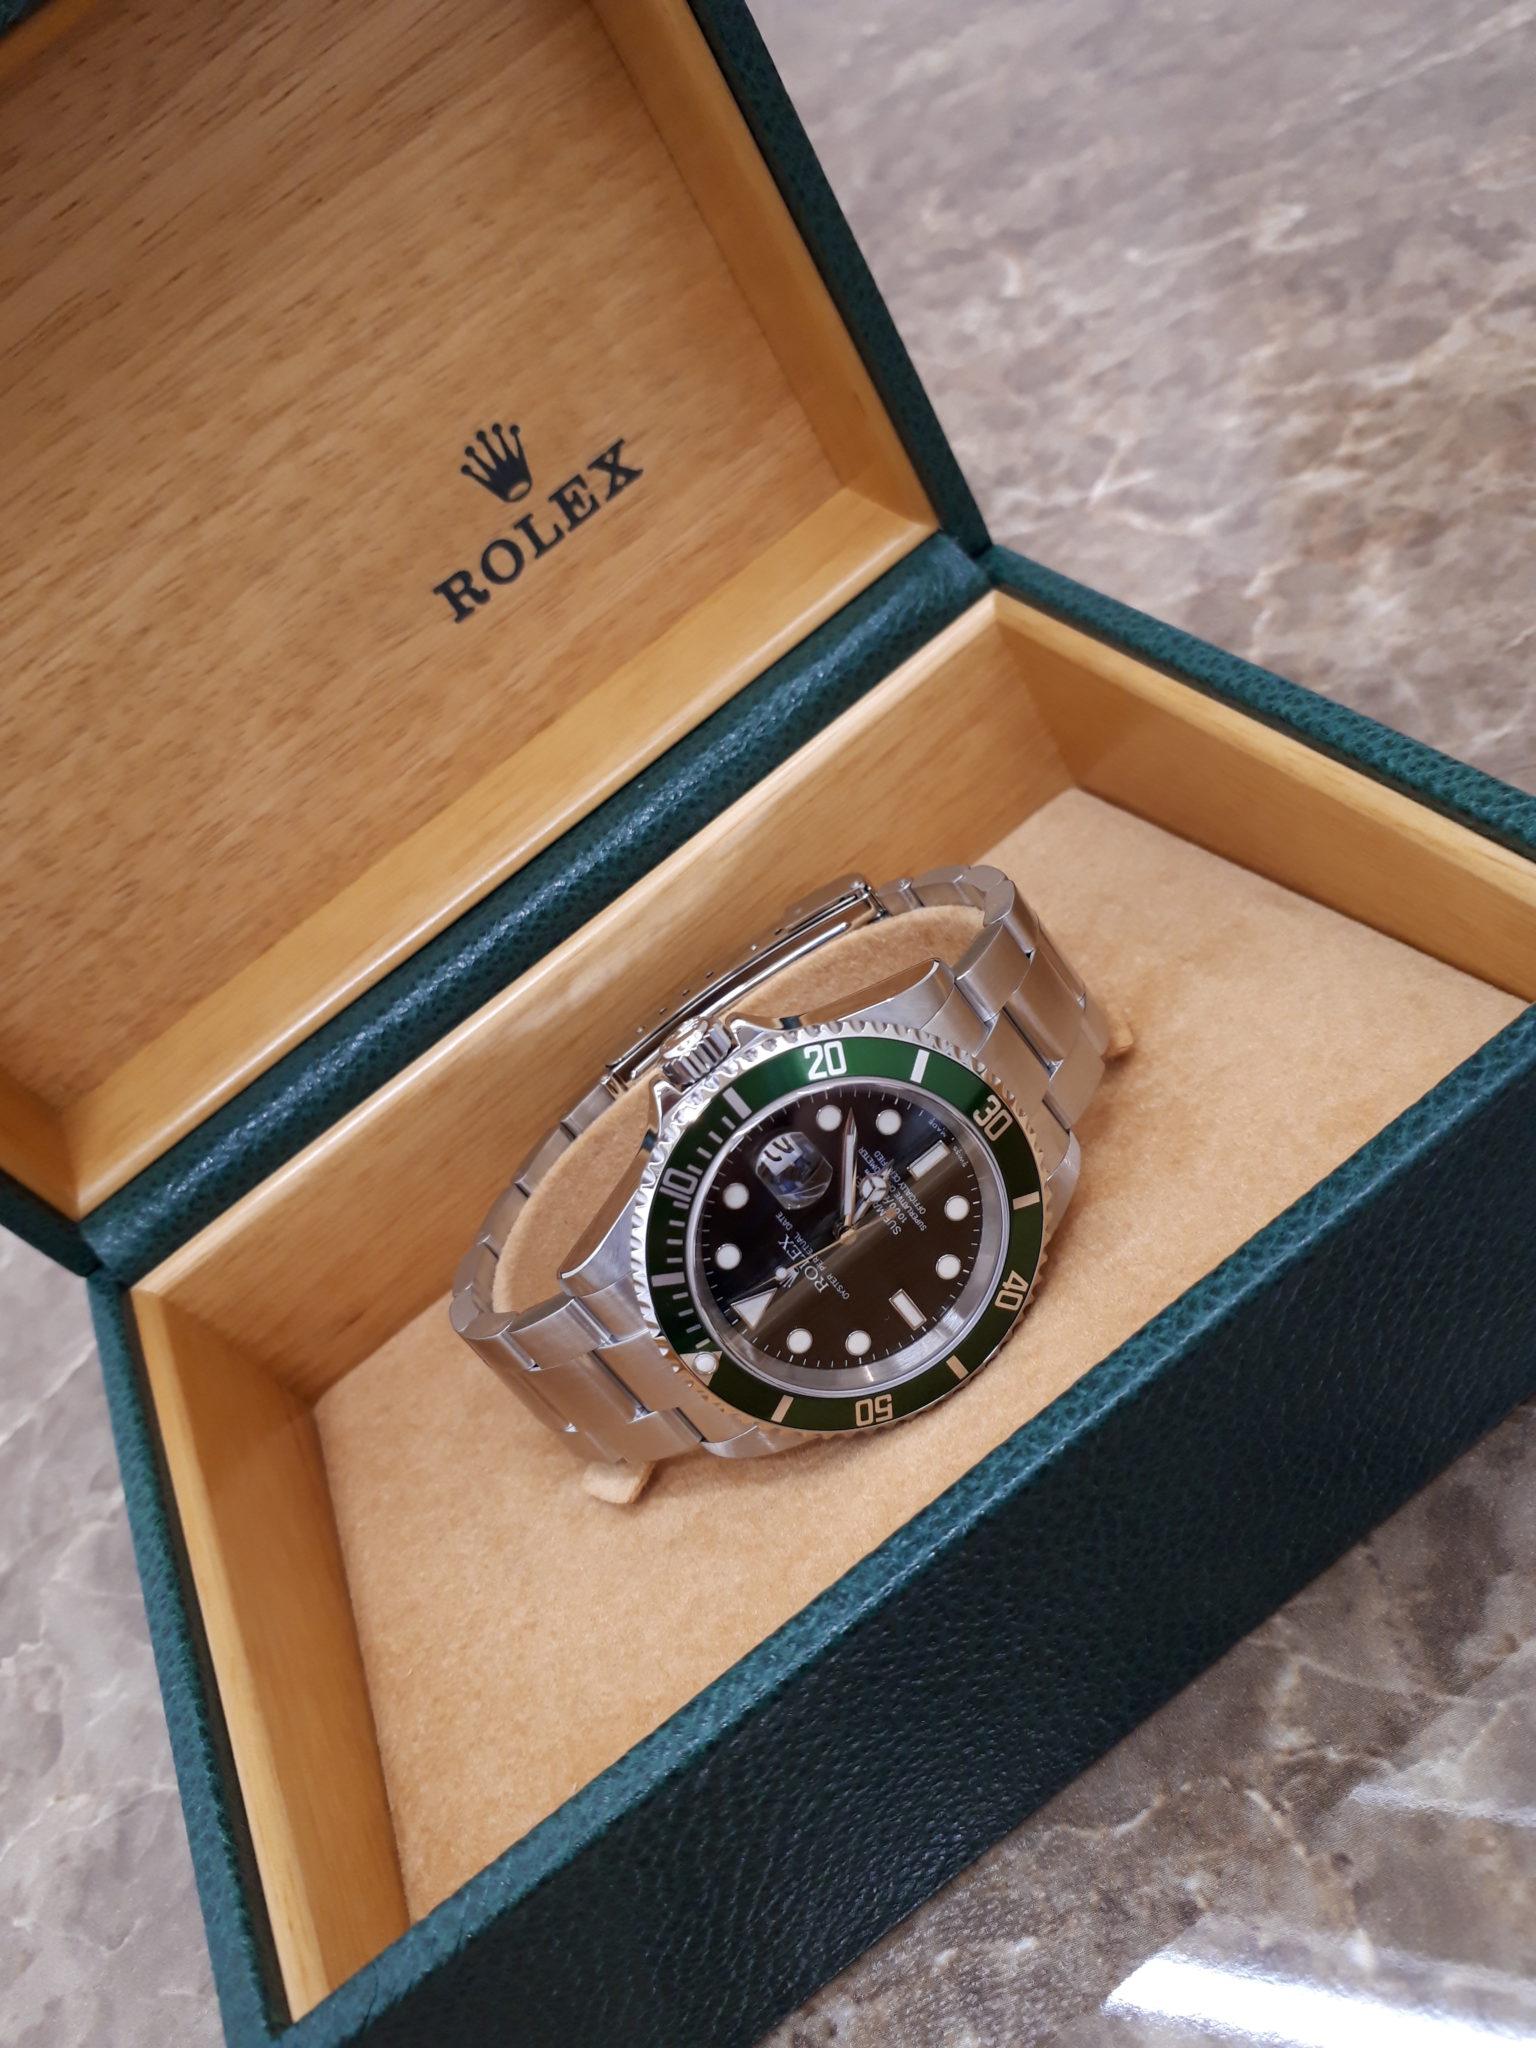 ROLEX  16610LV  グリーンサブ